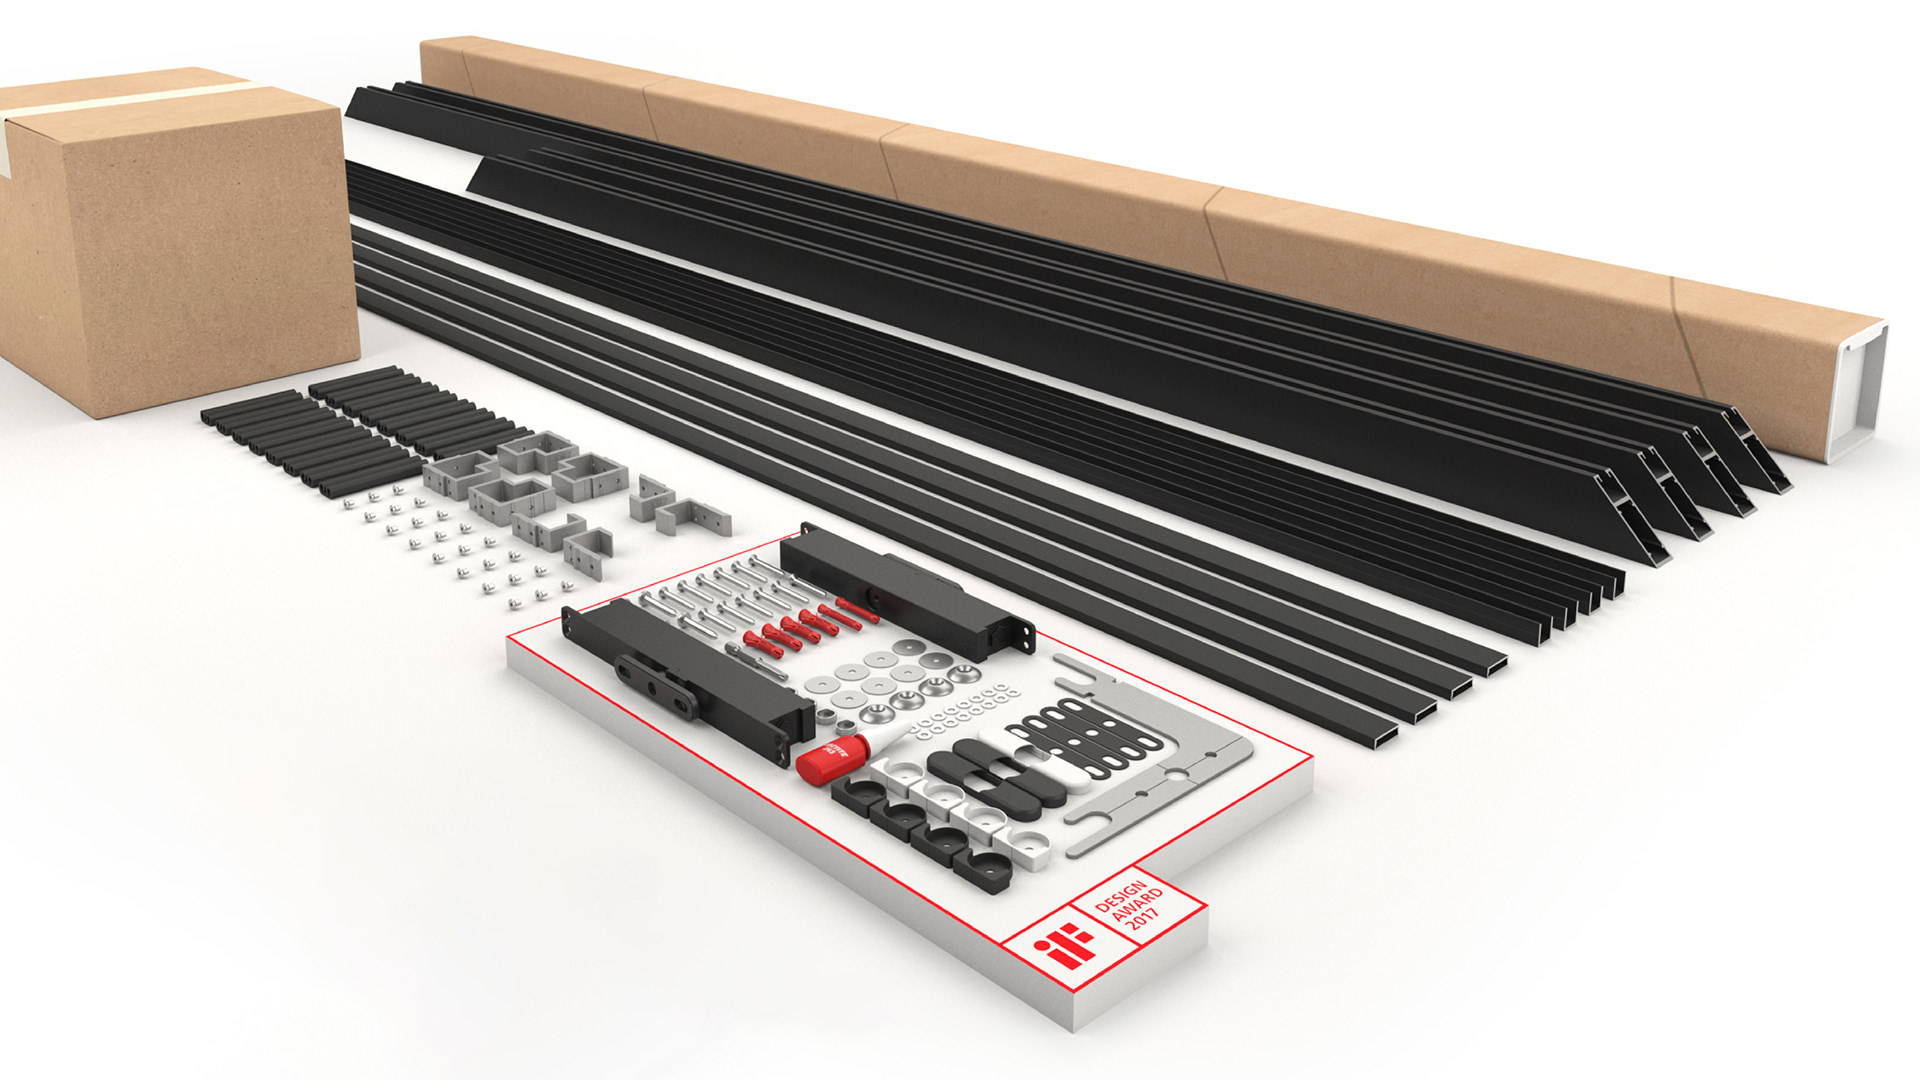 Portapivot 6530 XL self-assembly kit